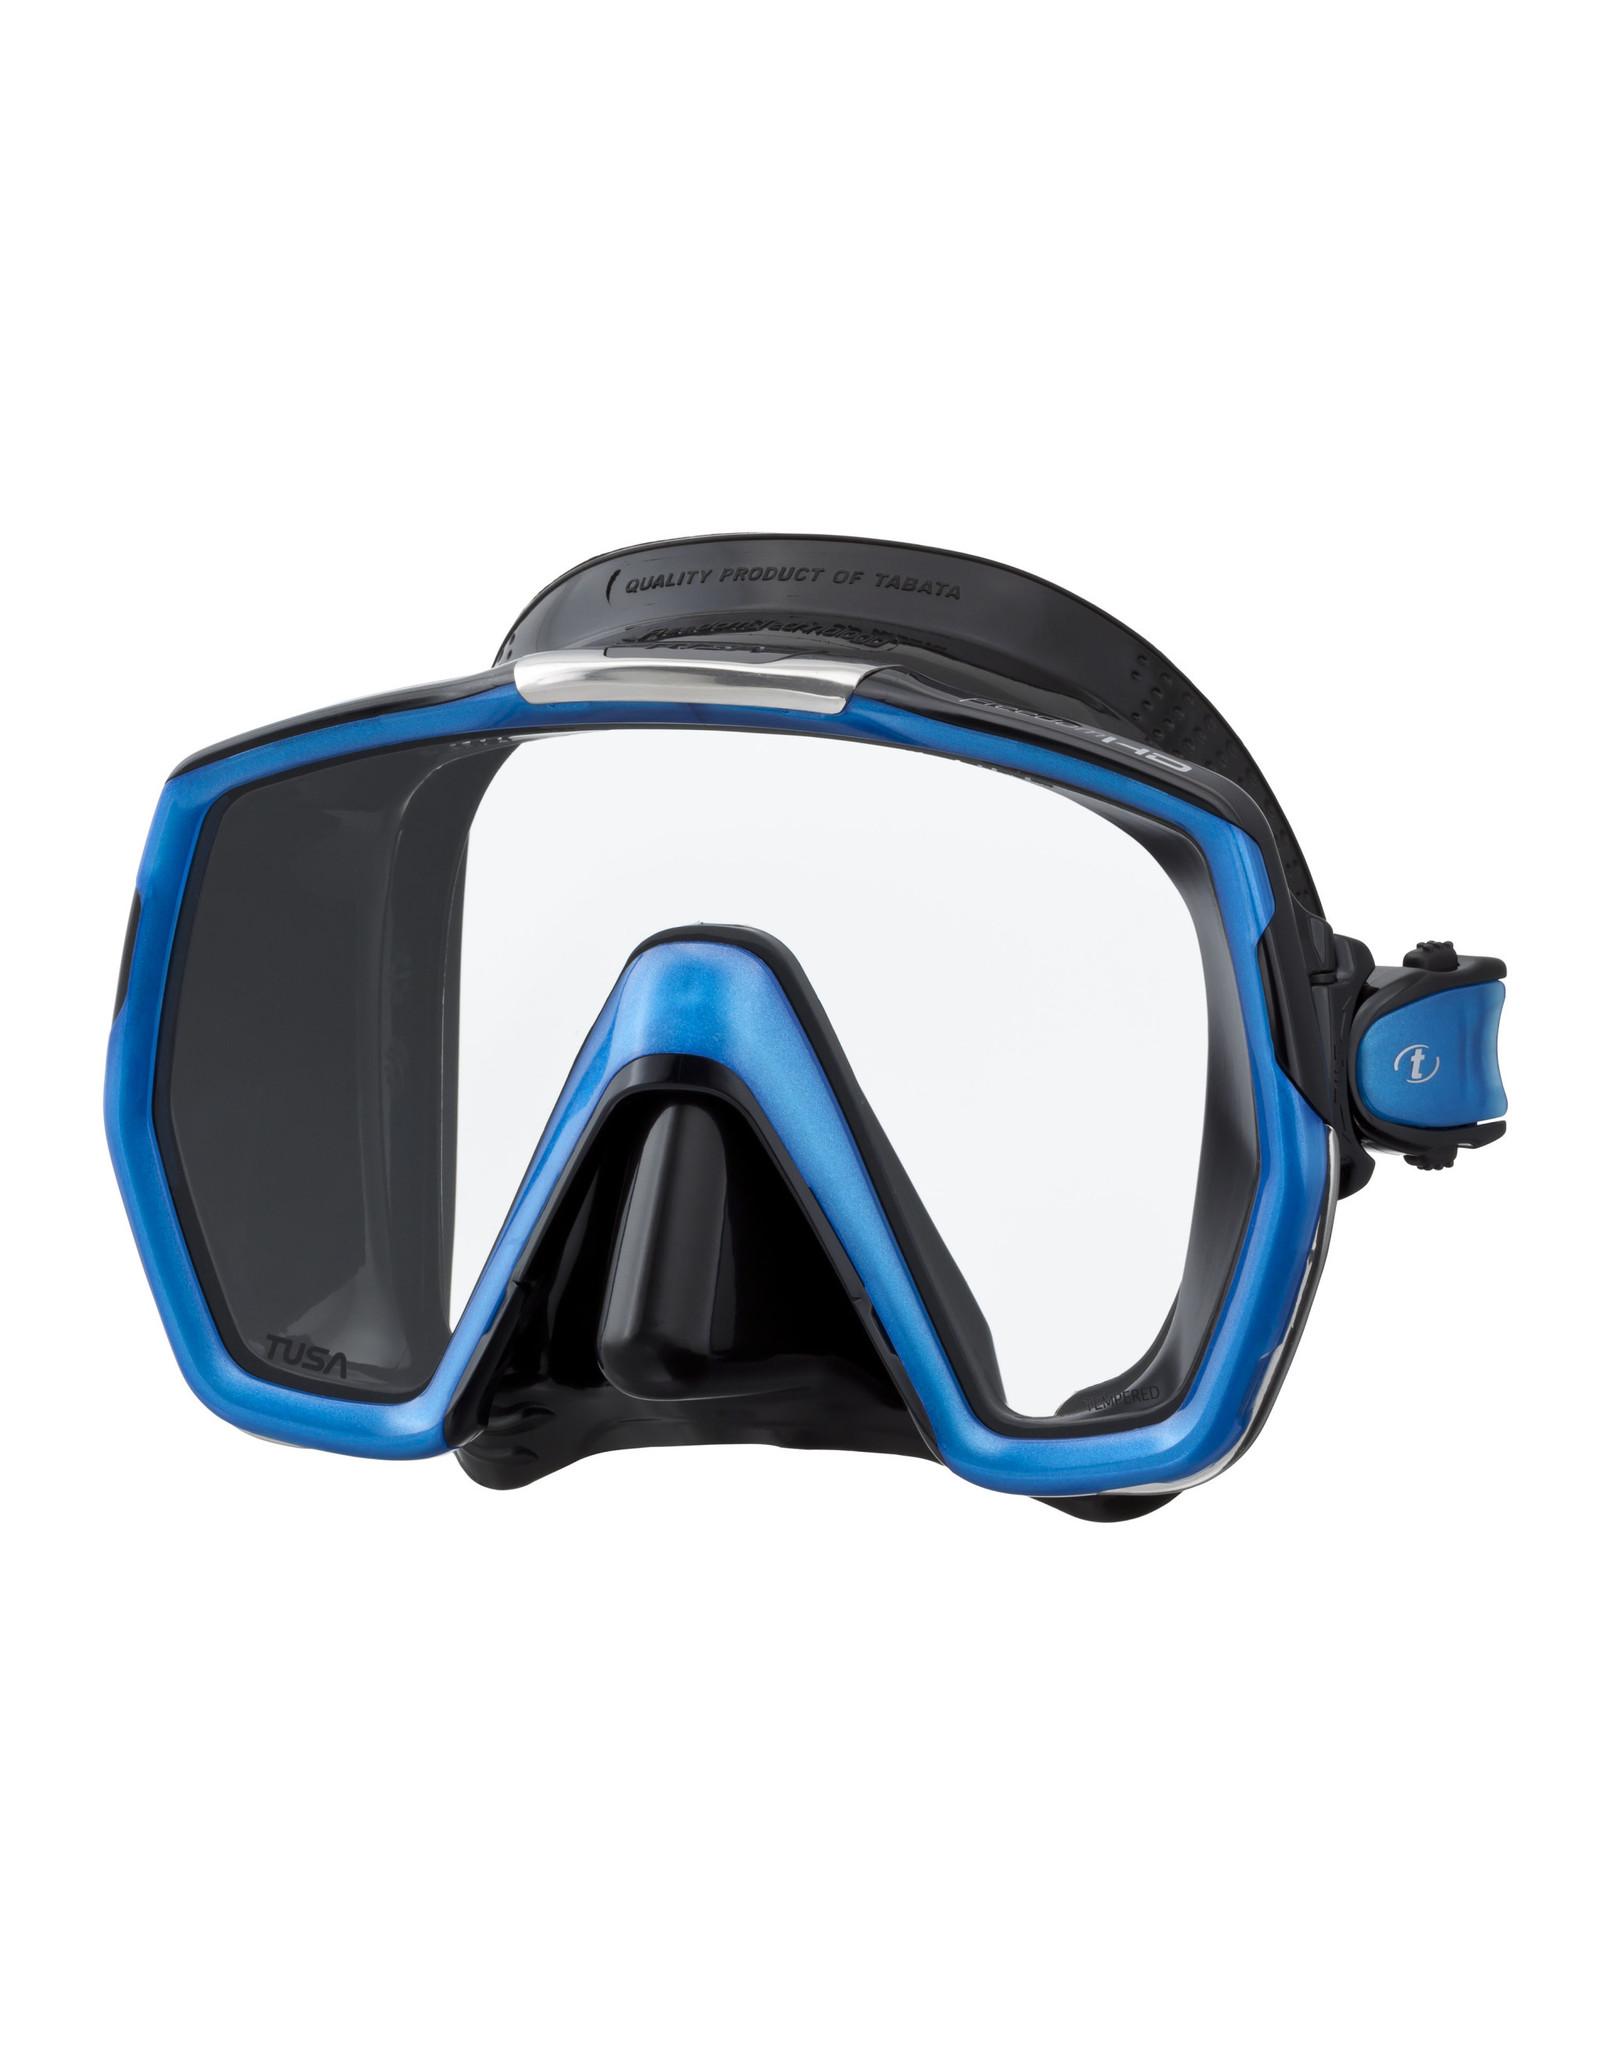 TUSA TUSA Freedom HD - Black/Fishtail Blue